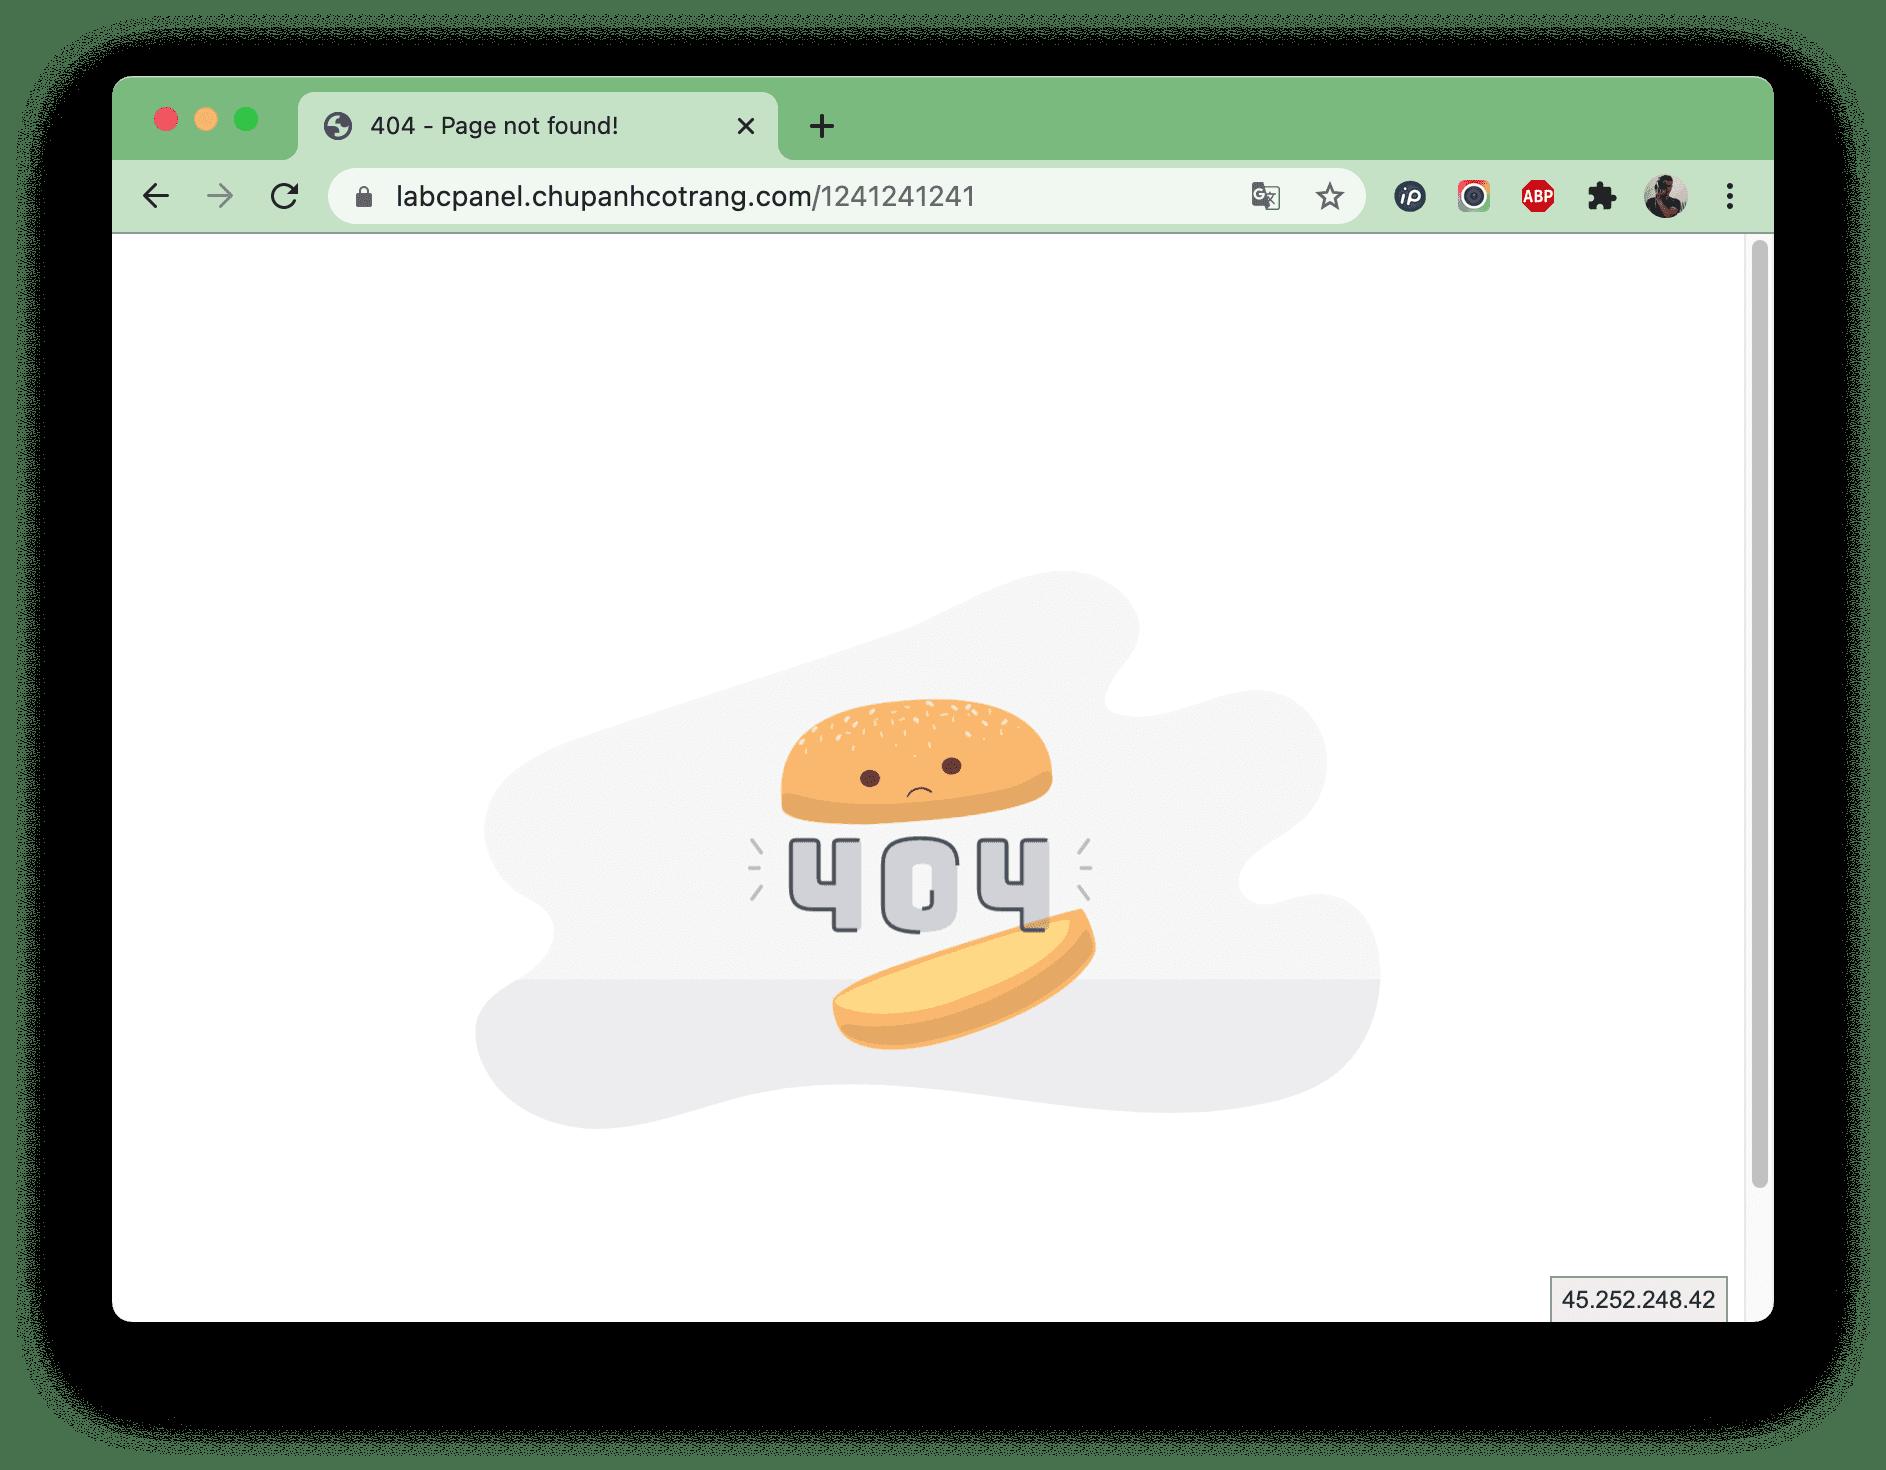 Tạo custom error pages với .htaccess